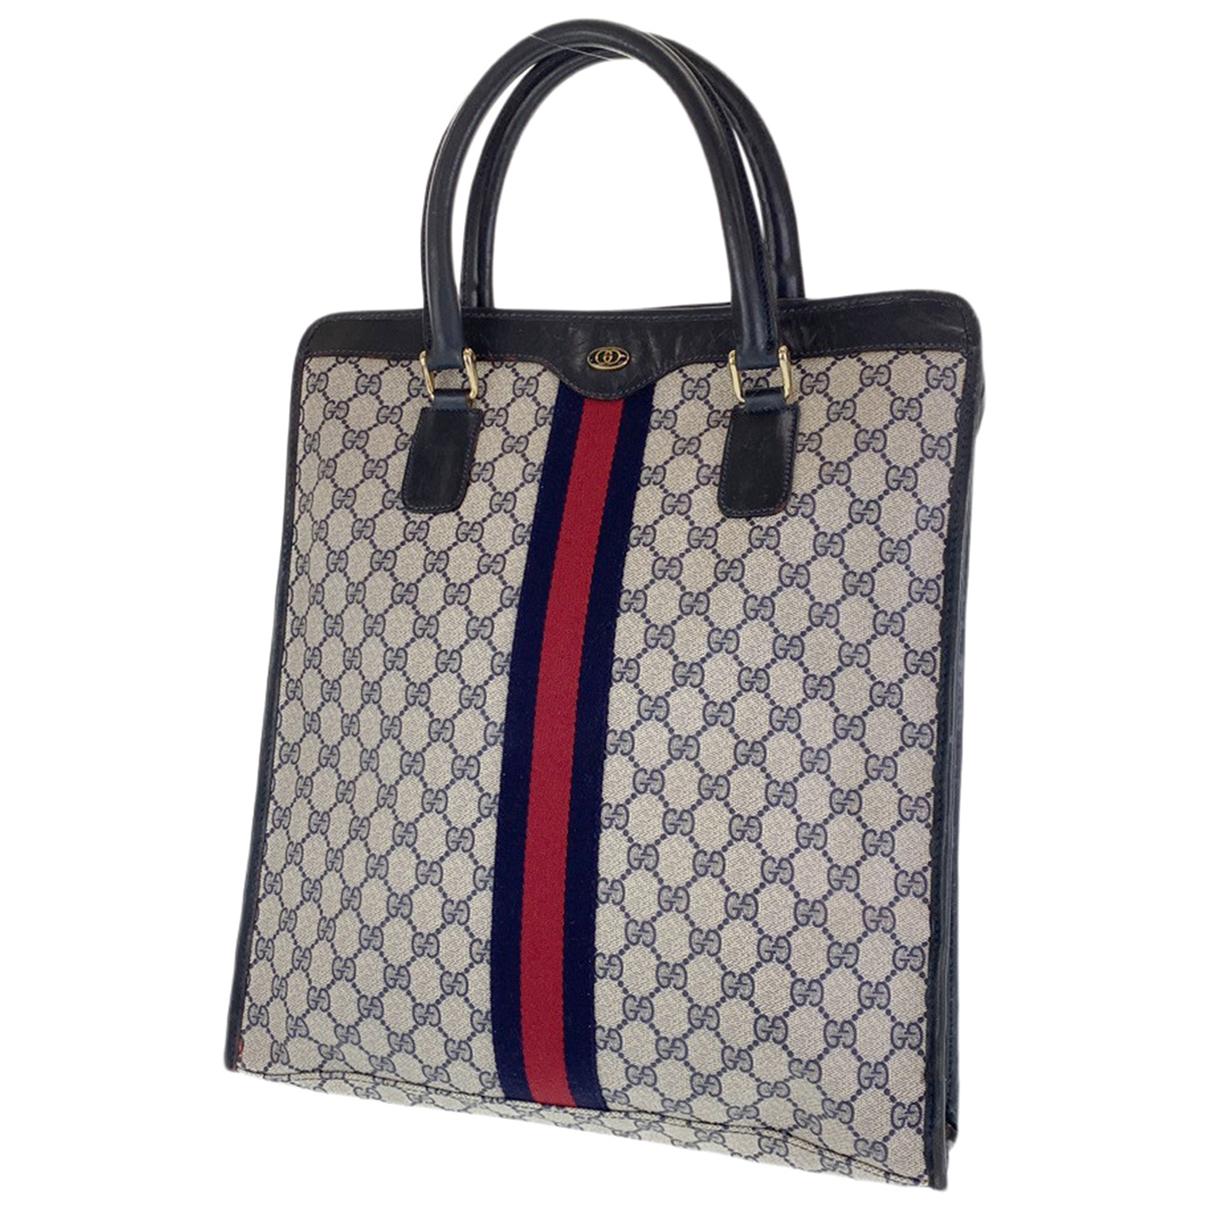 Gucci N handbag for Women N